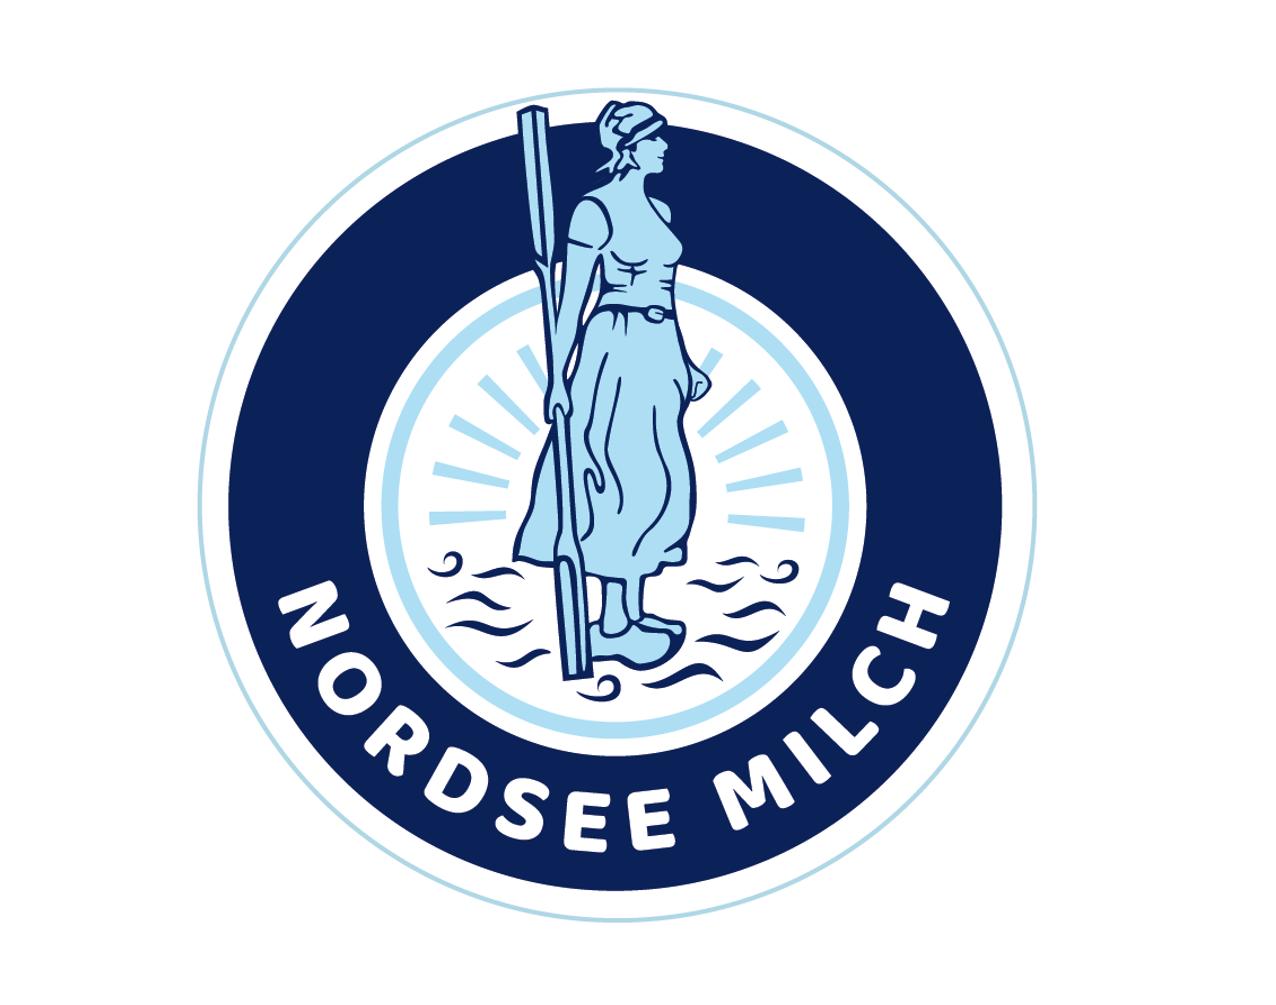 Logo Nordseemilch